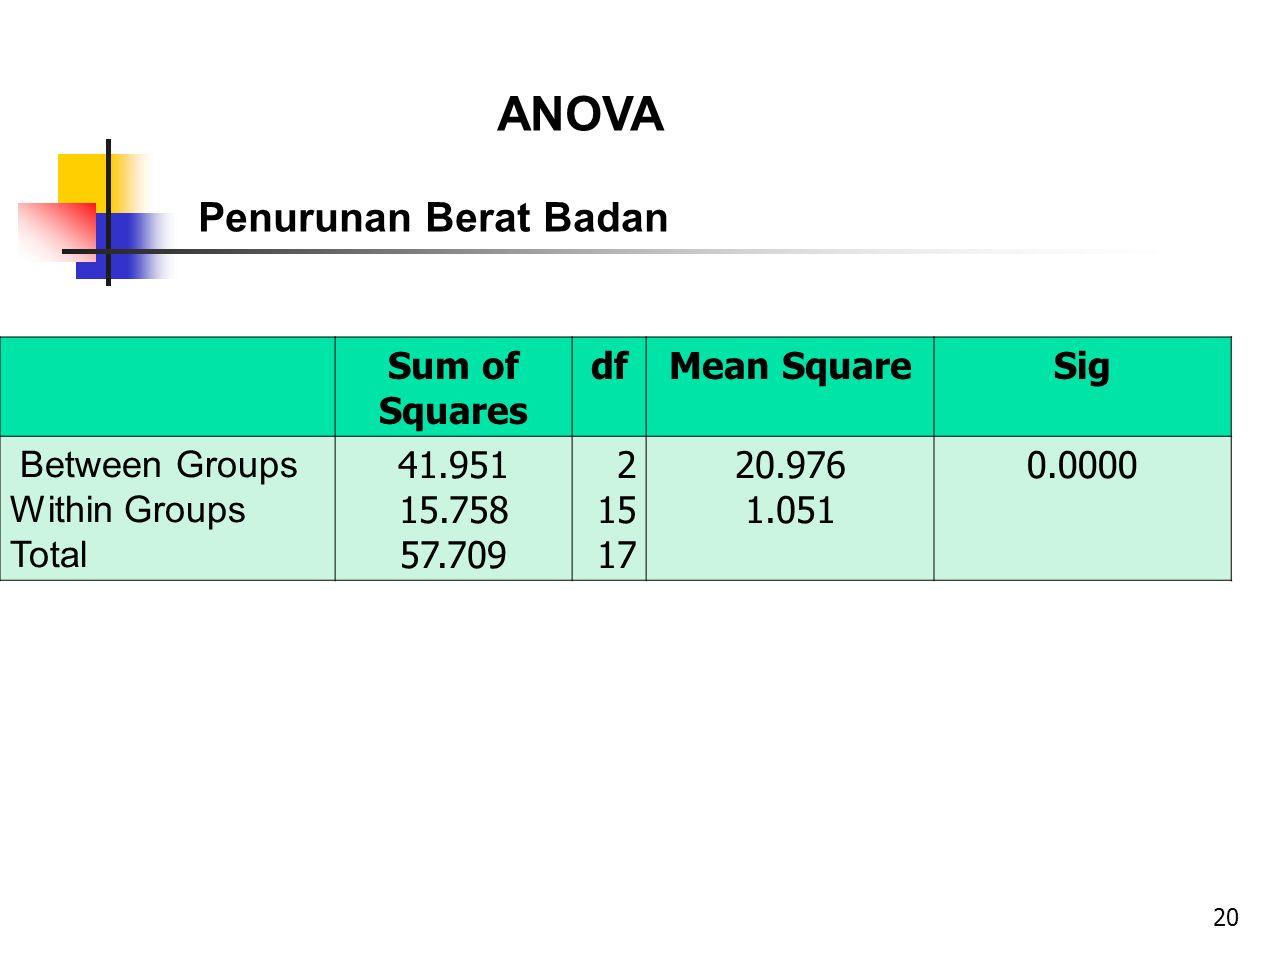 Sum of Squares dfMean SquareSig Between Groups Within Groups Total 41.951 15.758 57.709 2 15 17 20.976 1.051 0.0000 ANOVA Penurunan Berat Badan 20